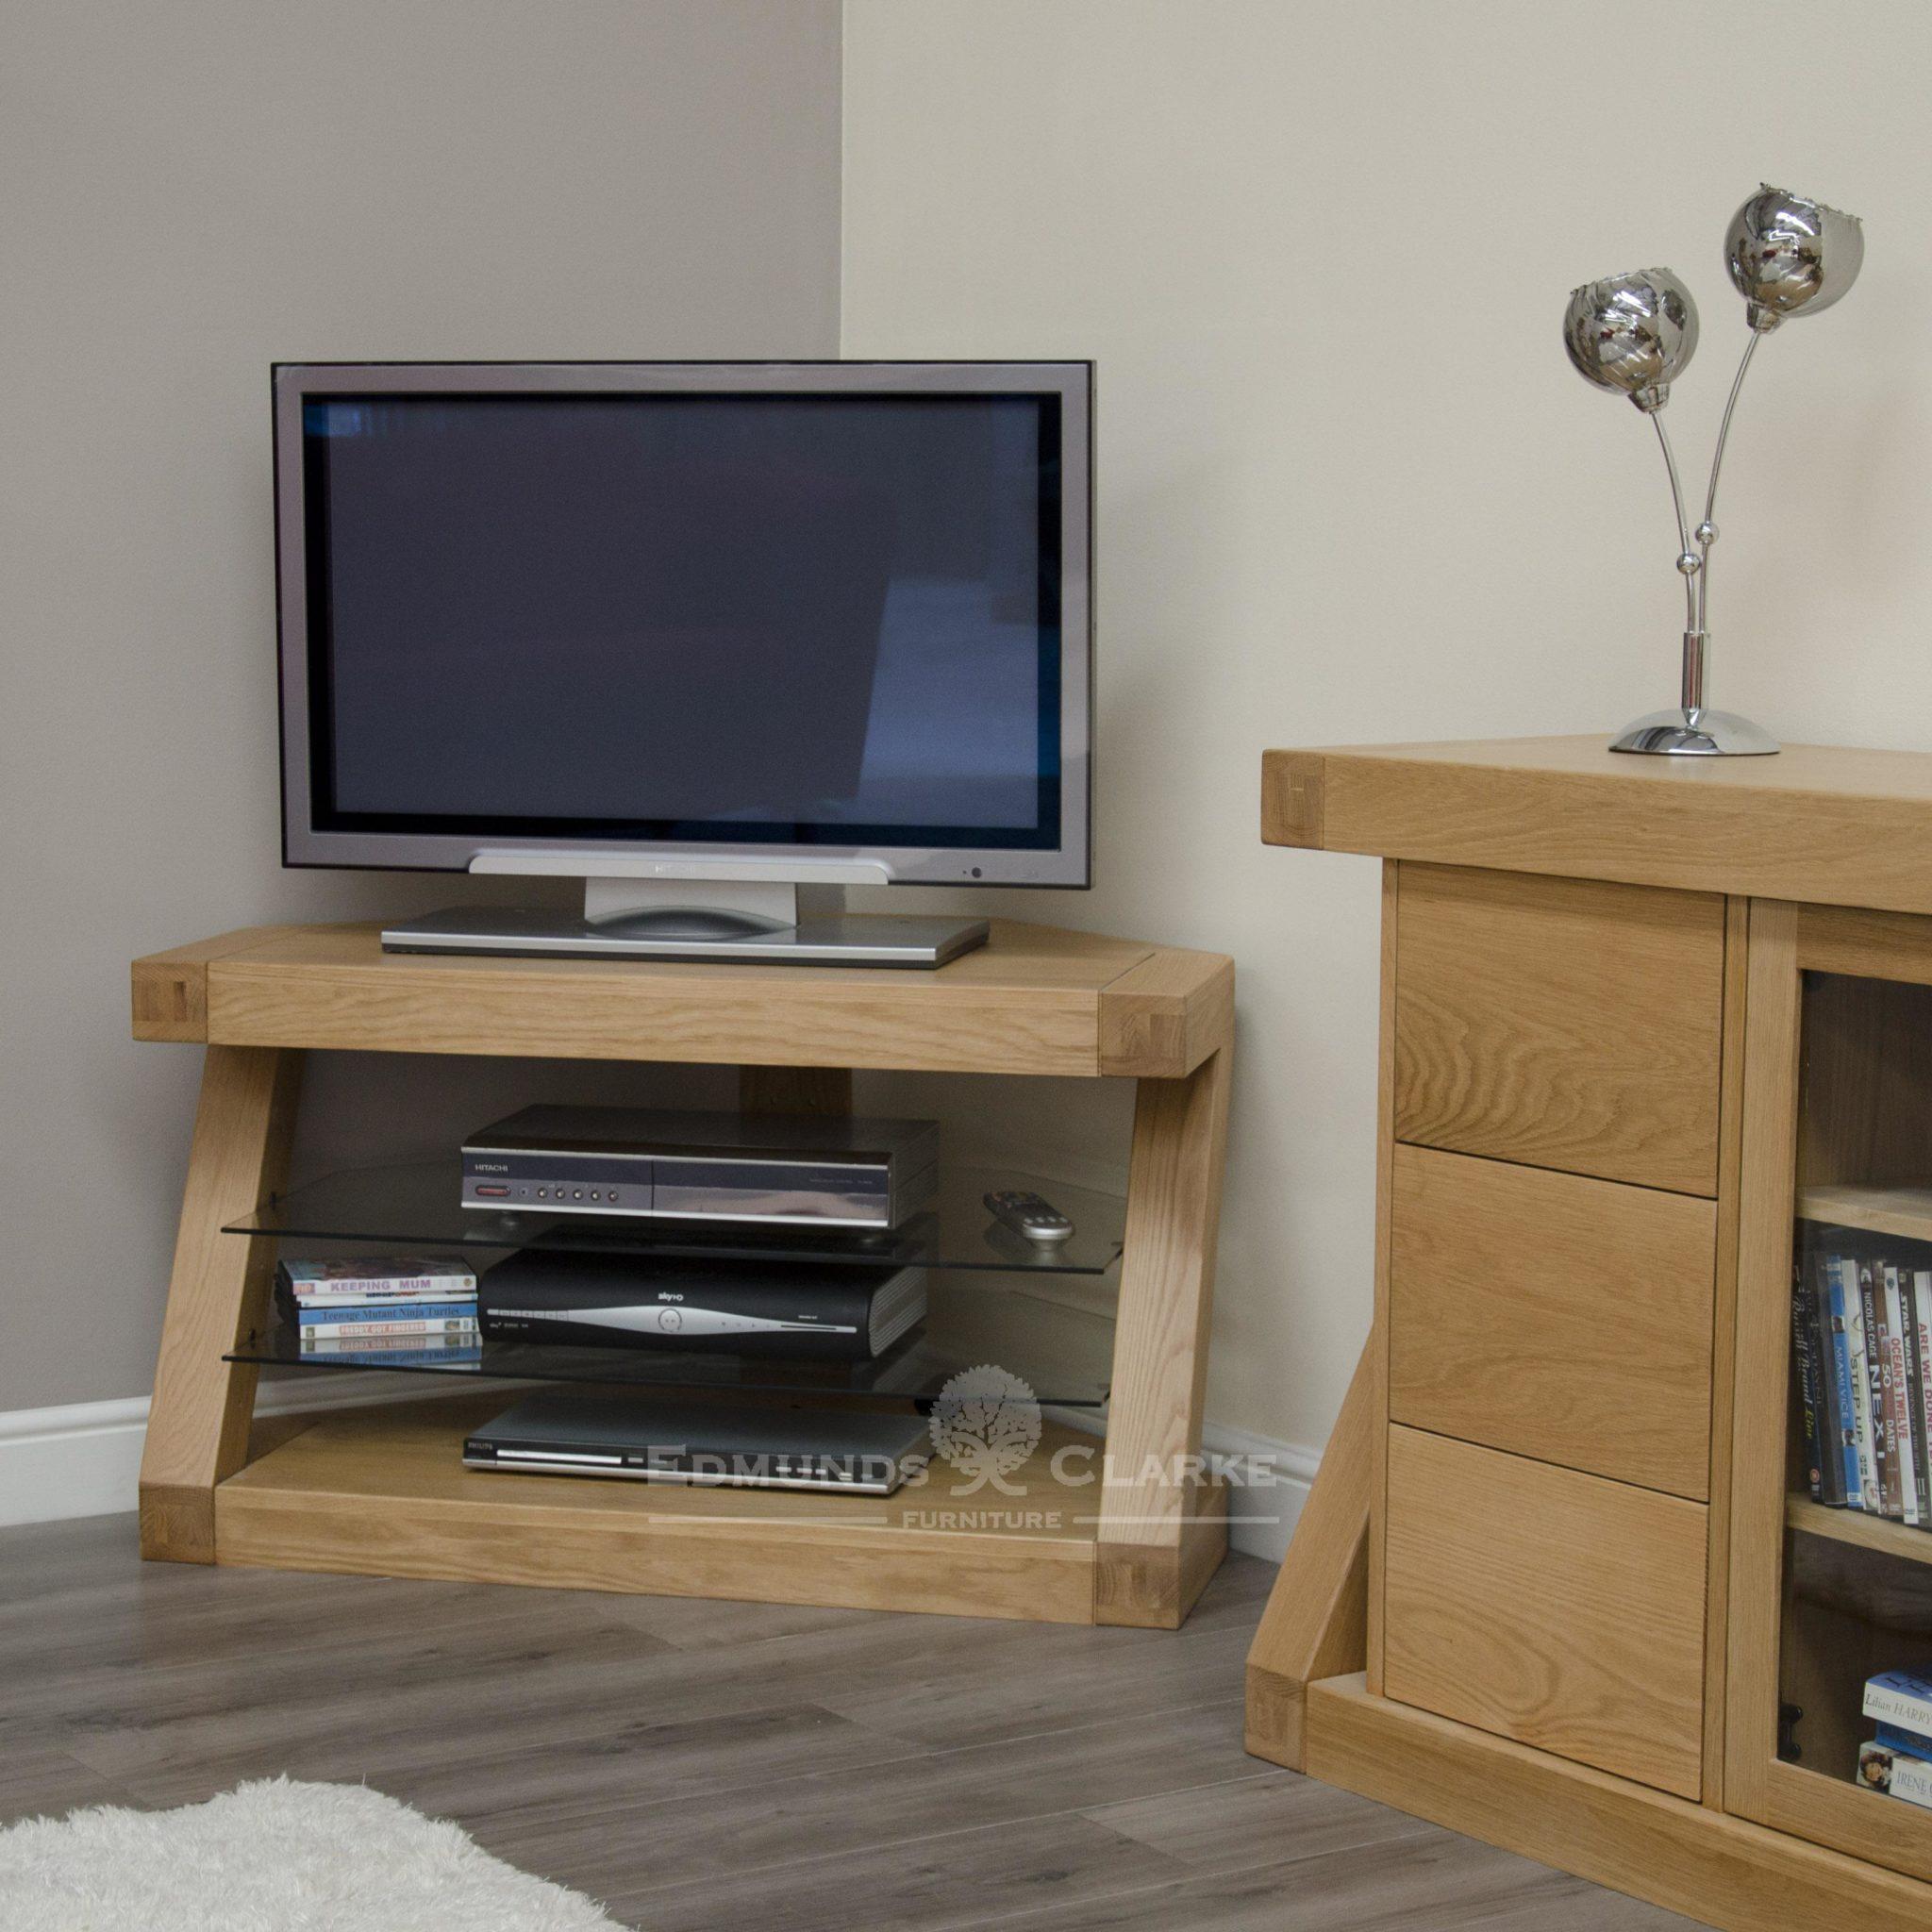 Z designer modern shaped solid oak corner tv entertainment stand ZCORTV